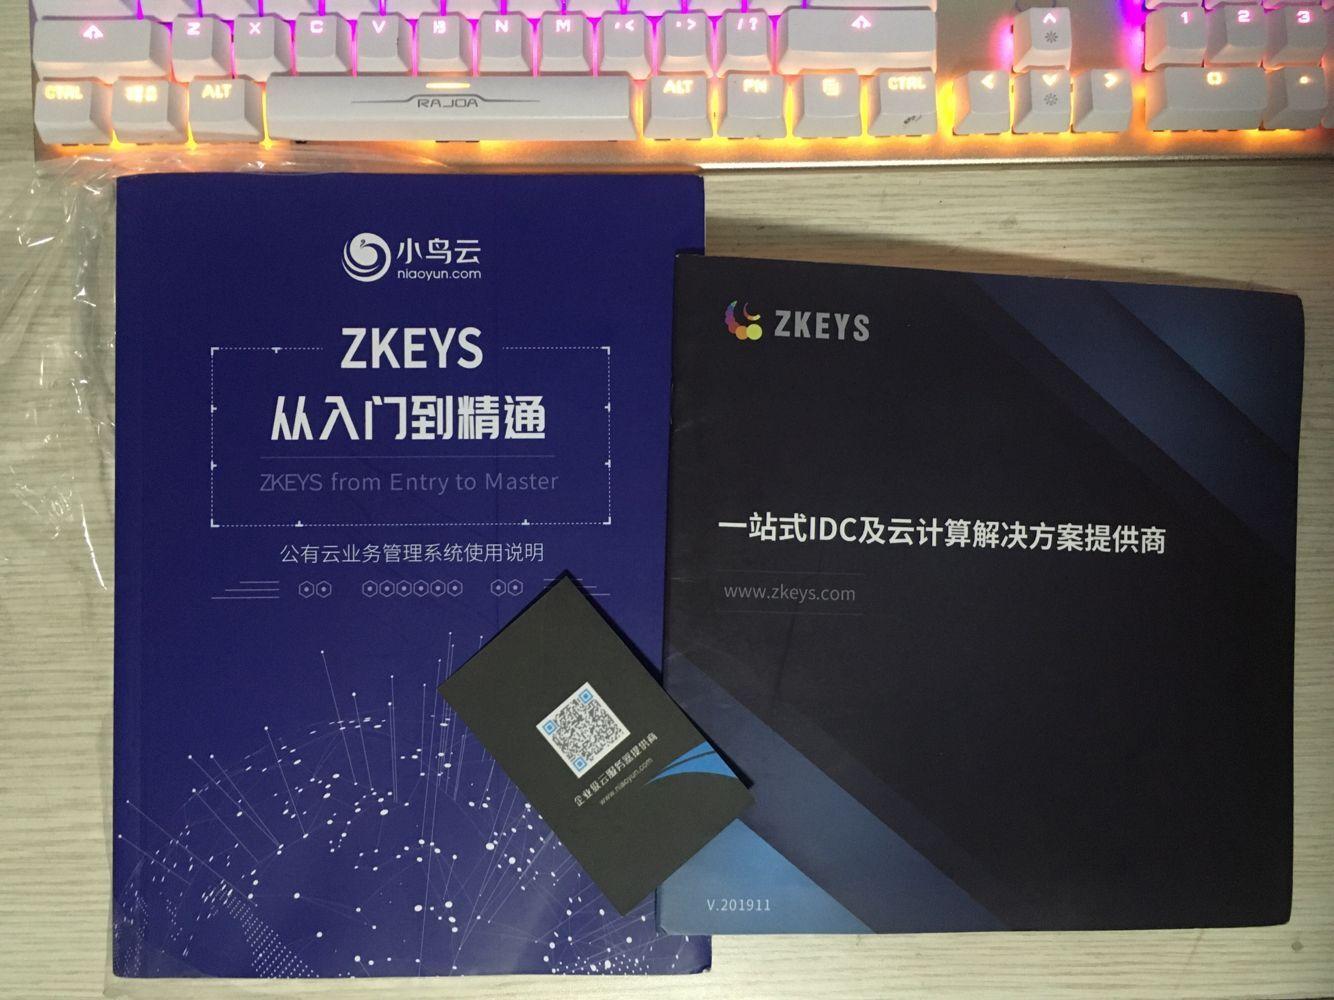 ZKEYS域名主机管理系统小鸟云